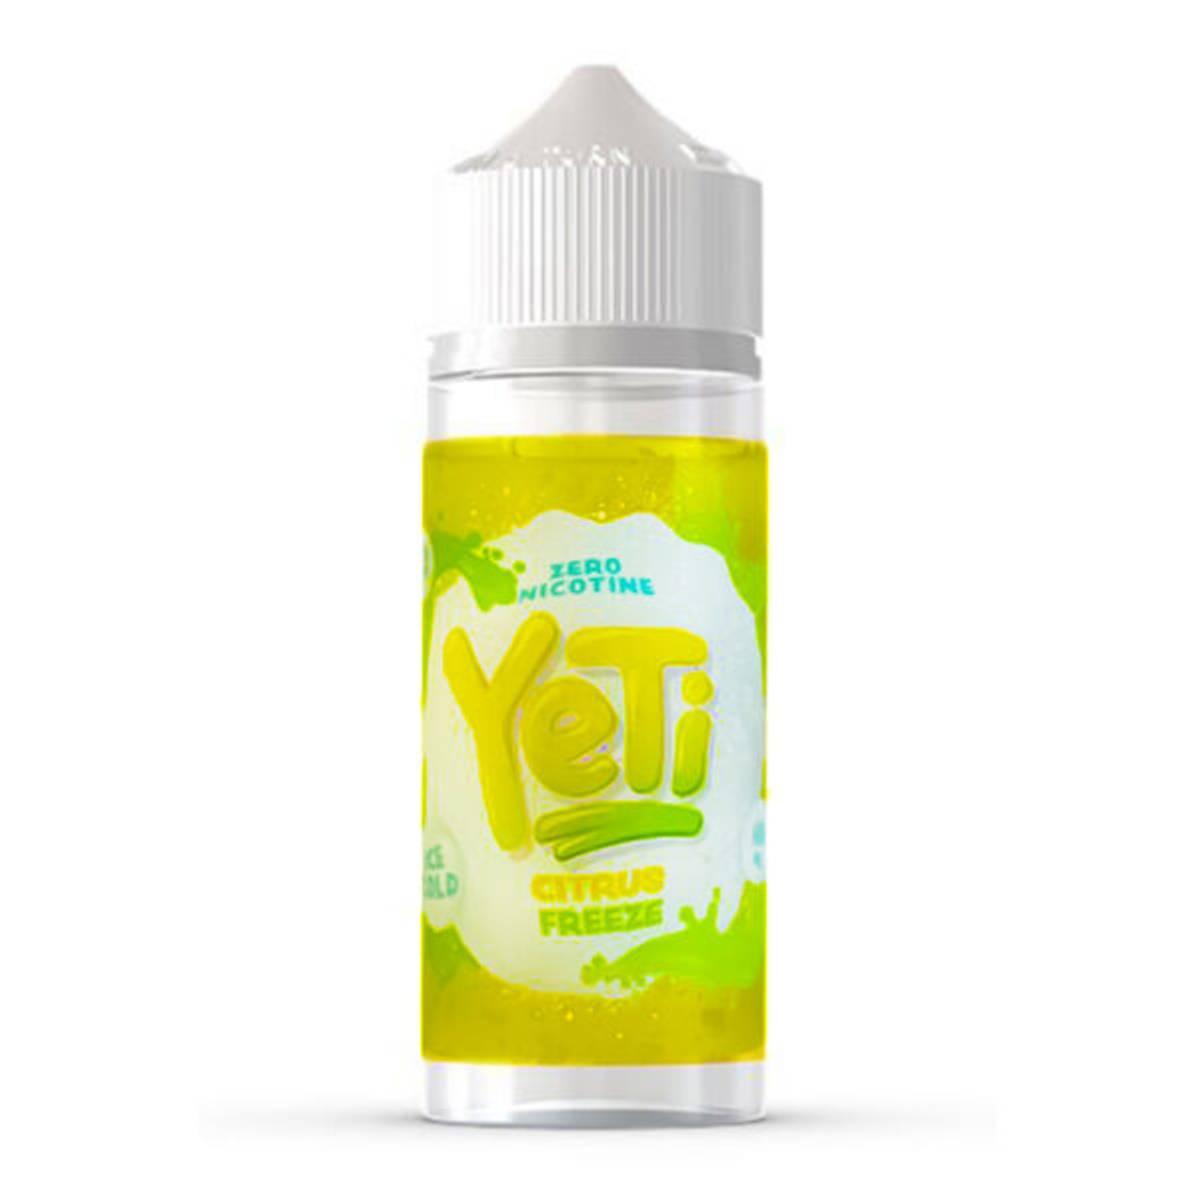 Yeti - Ice Cold Citrus Freeze, Ejuice 100/120 ml